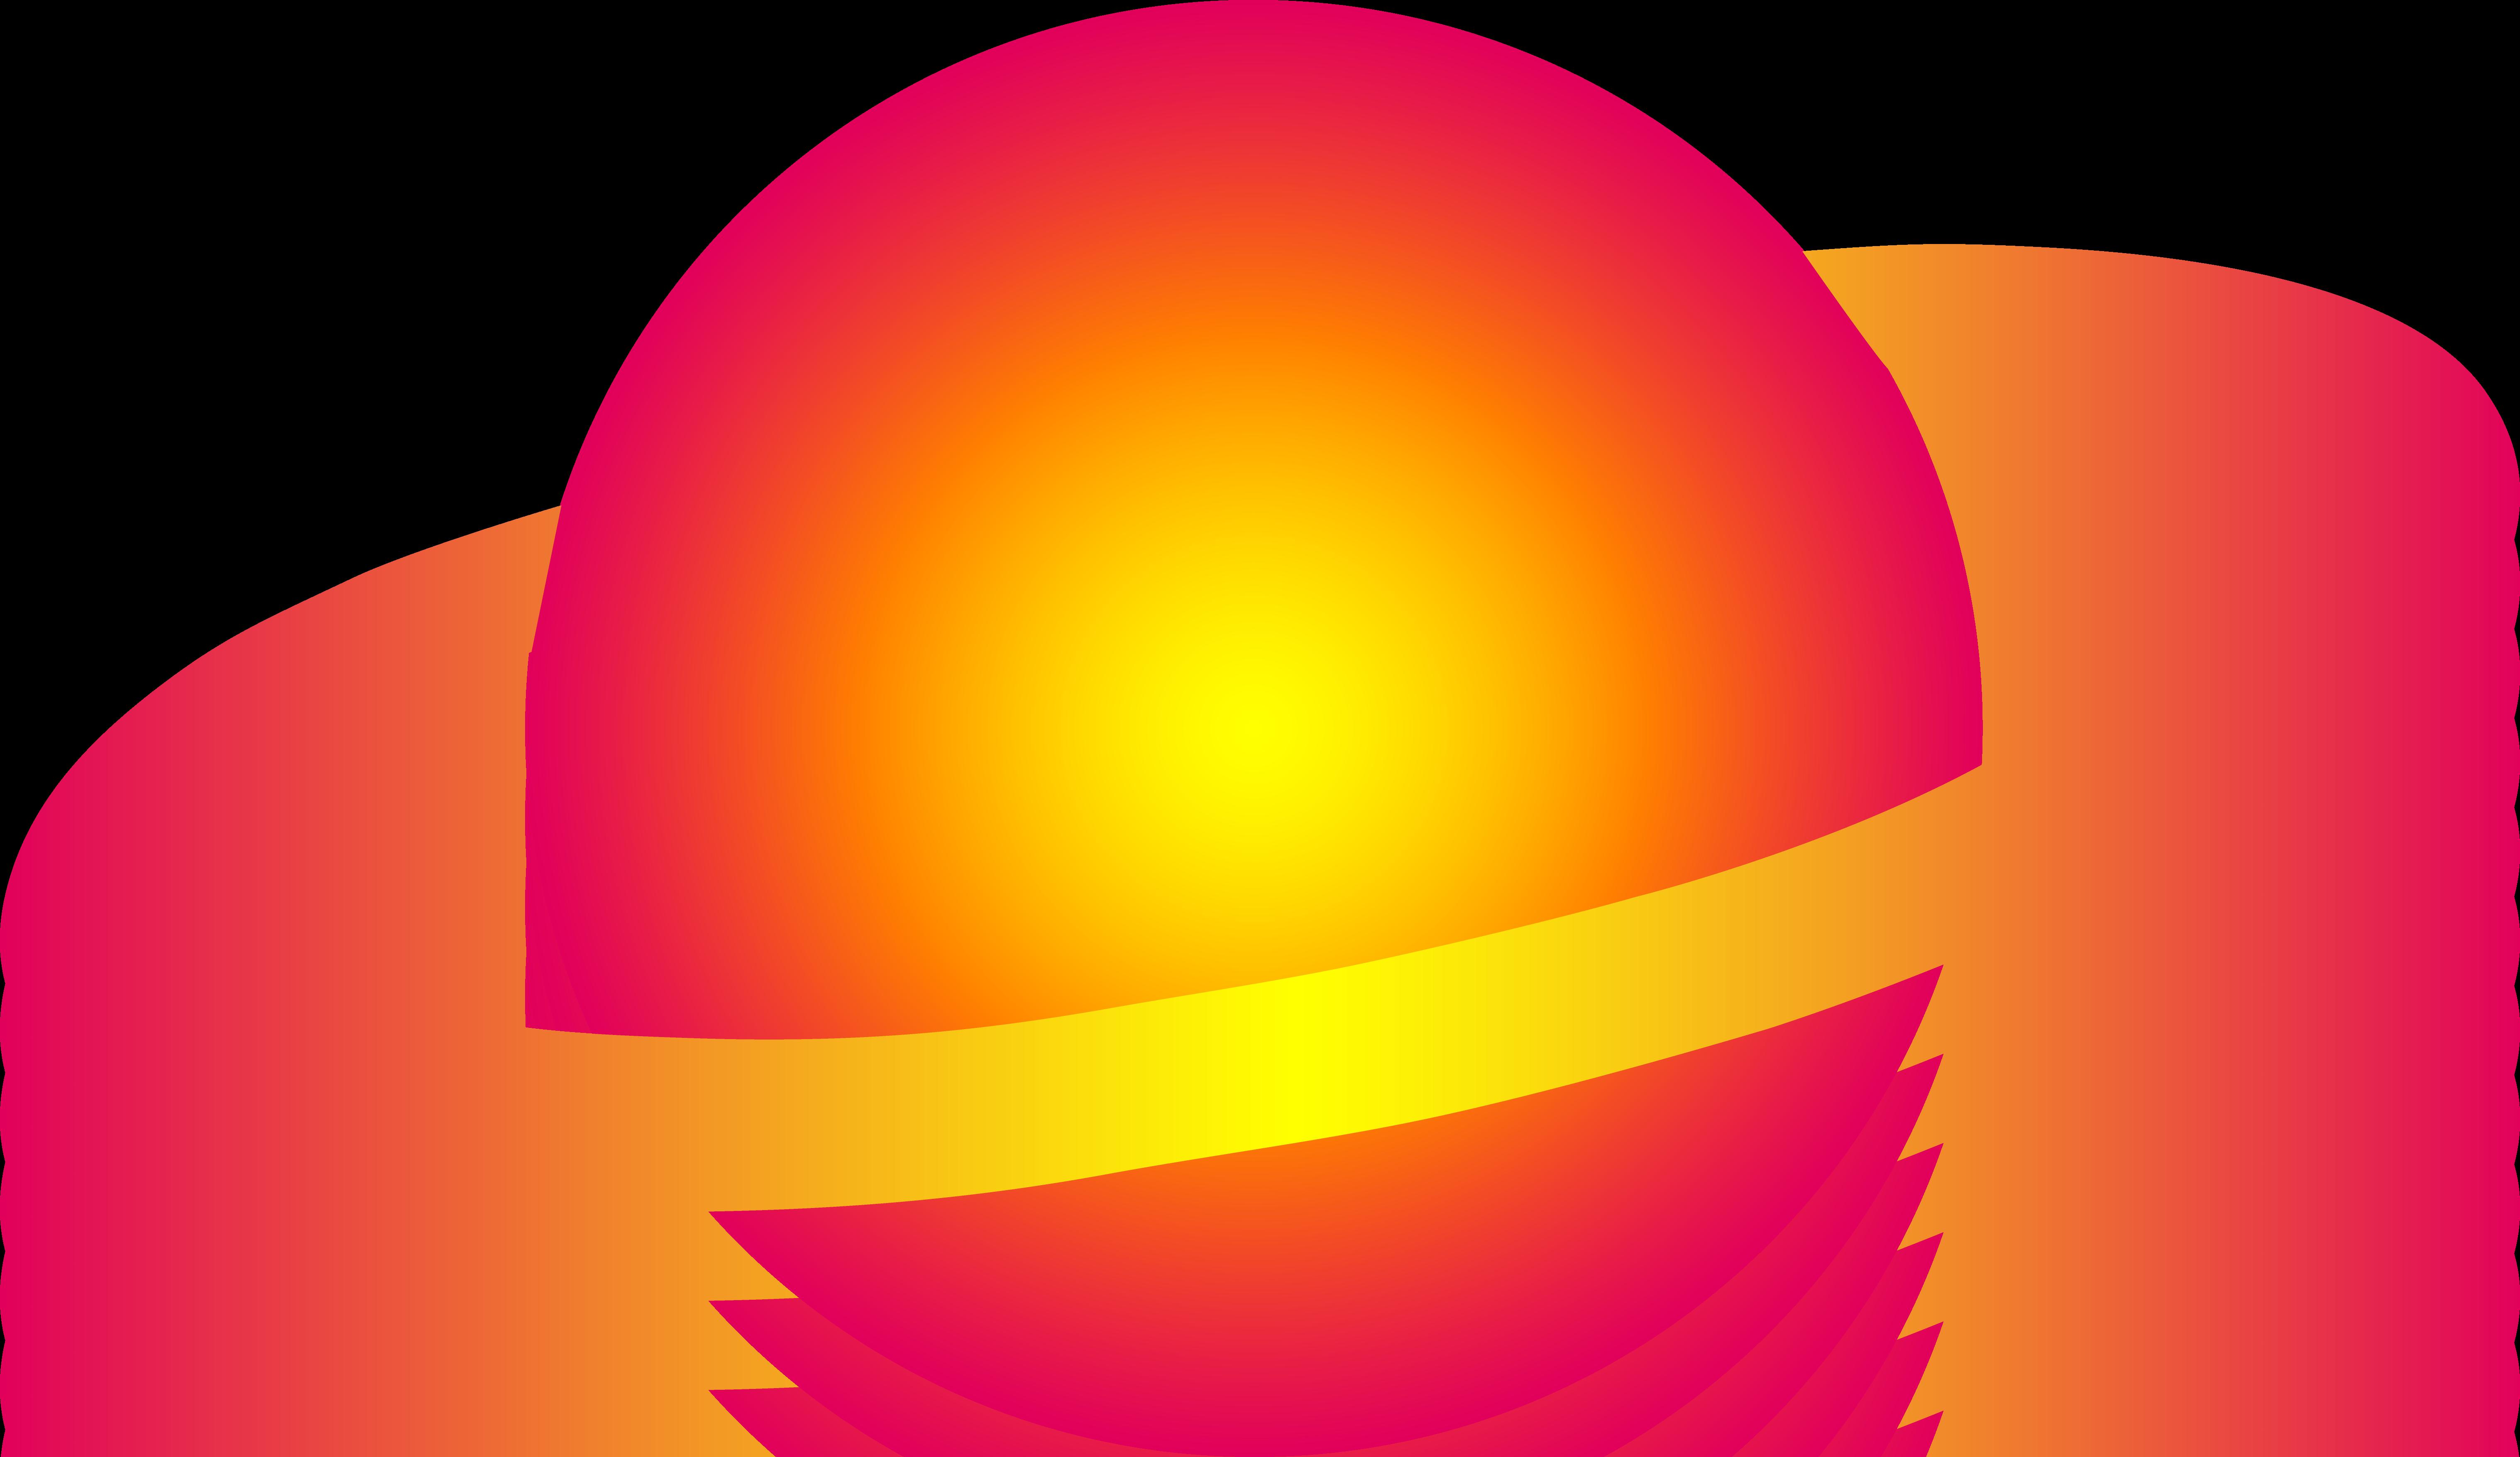 Planet clipart. Mercury cartoon cliparts free